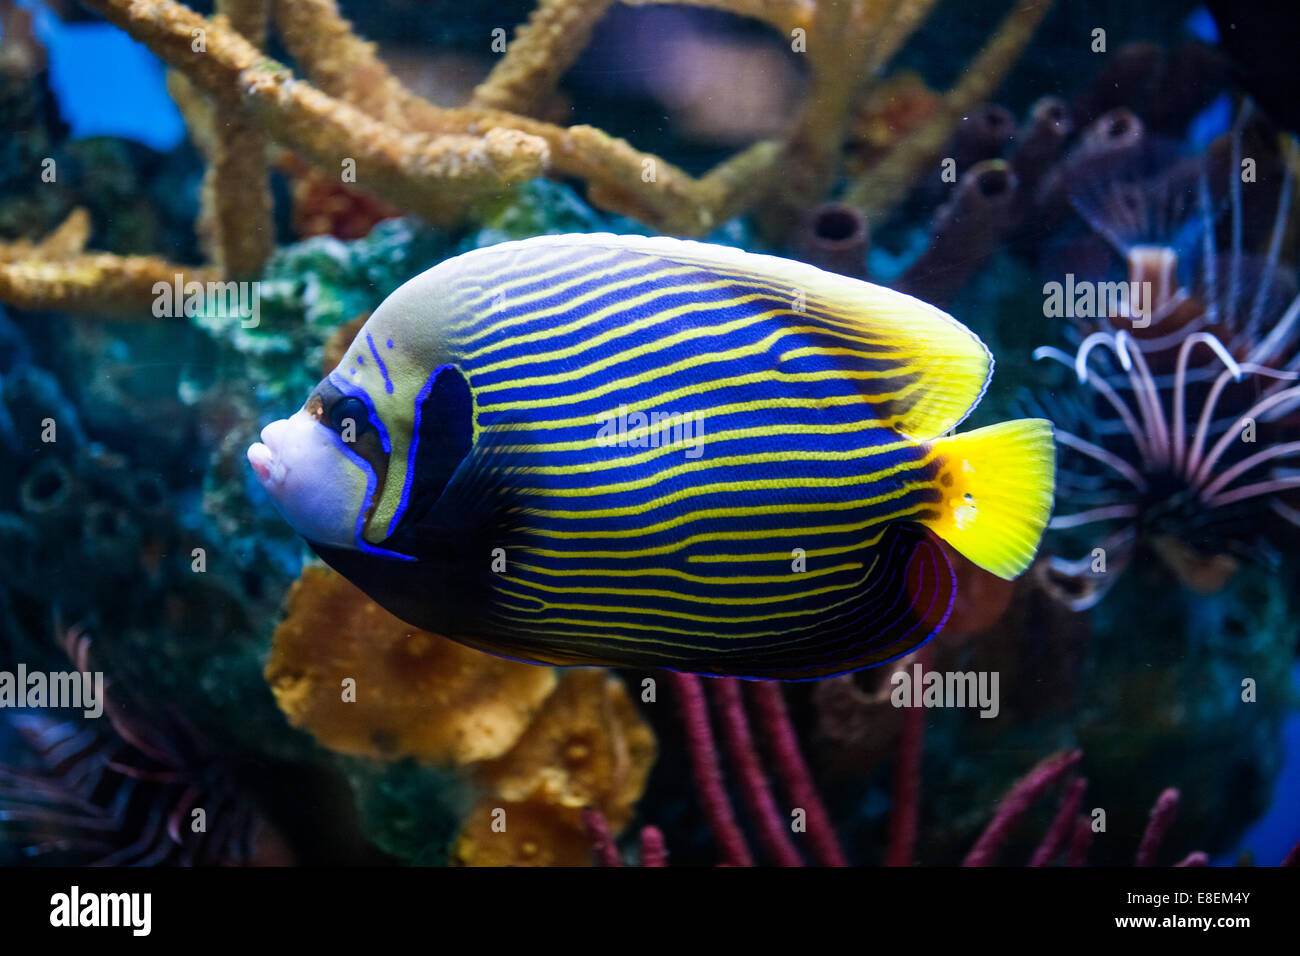 Imperial Anglefish Closeup in a Big Saltwater Aquarium - Stock Image